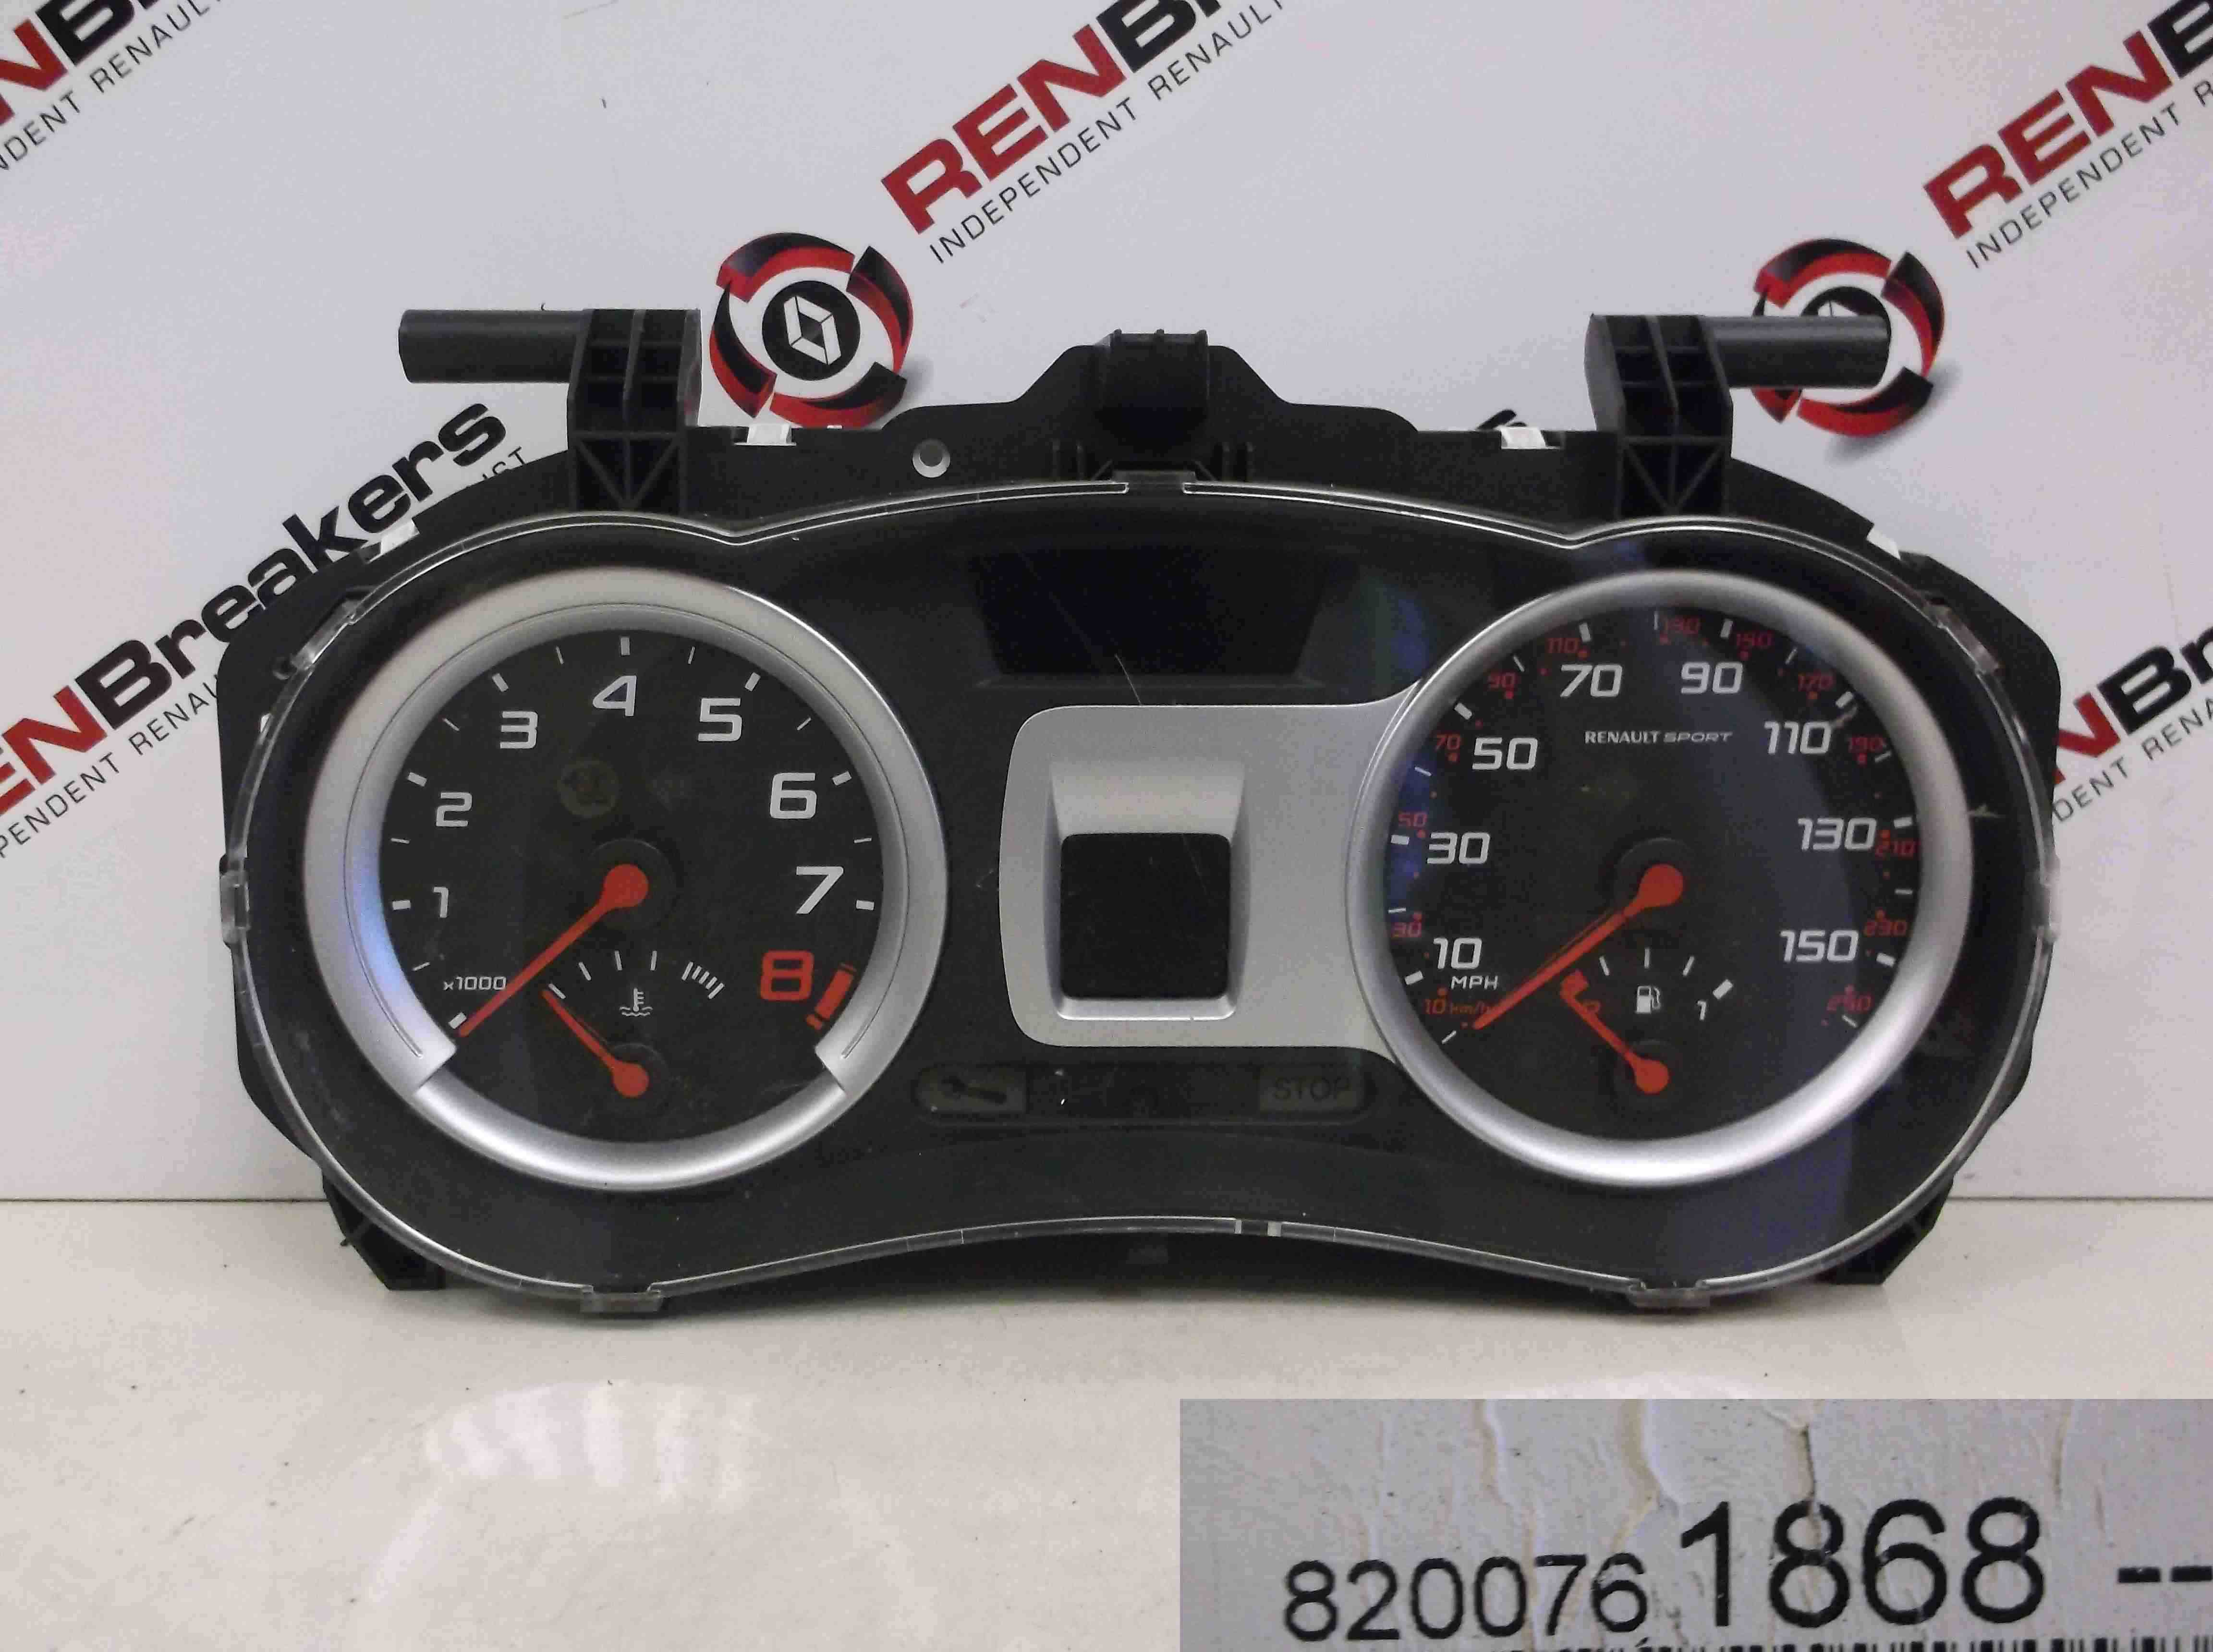 Renault Clio Sport 2005-2009 197 2.0 16v 85K Instrument Panel Dials Gauge Speed